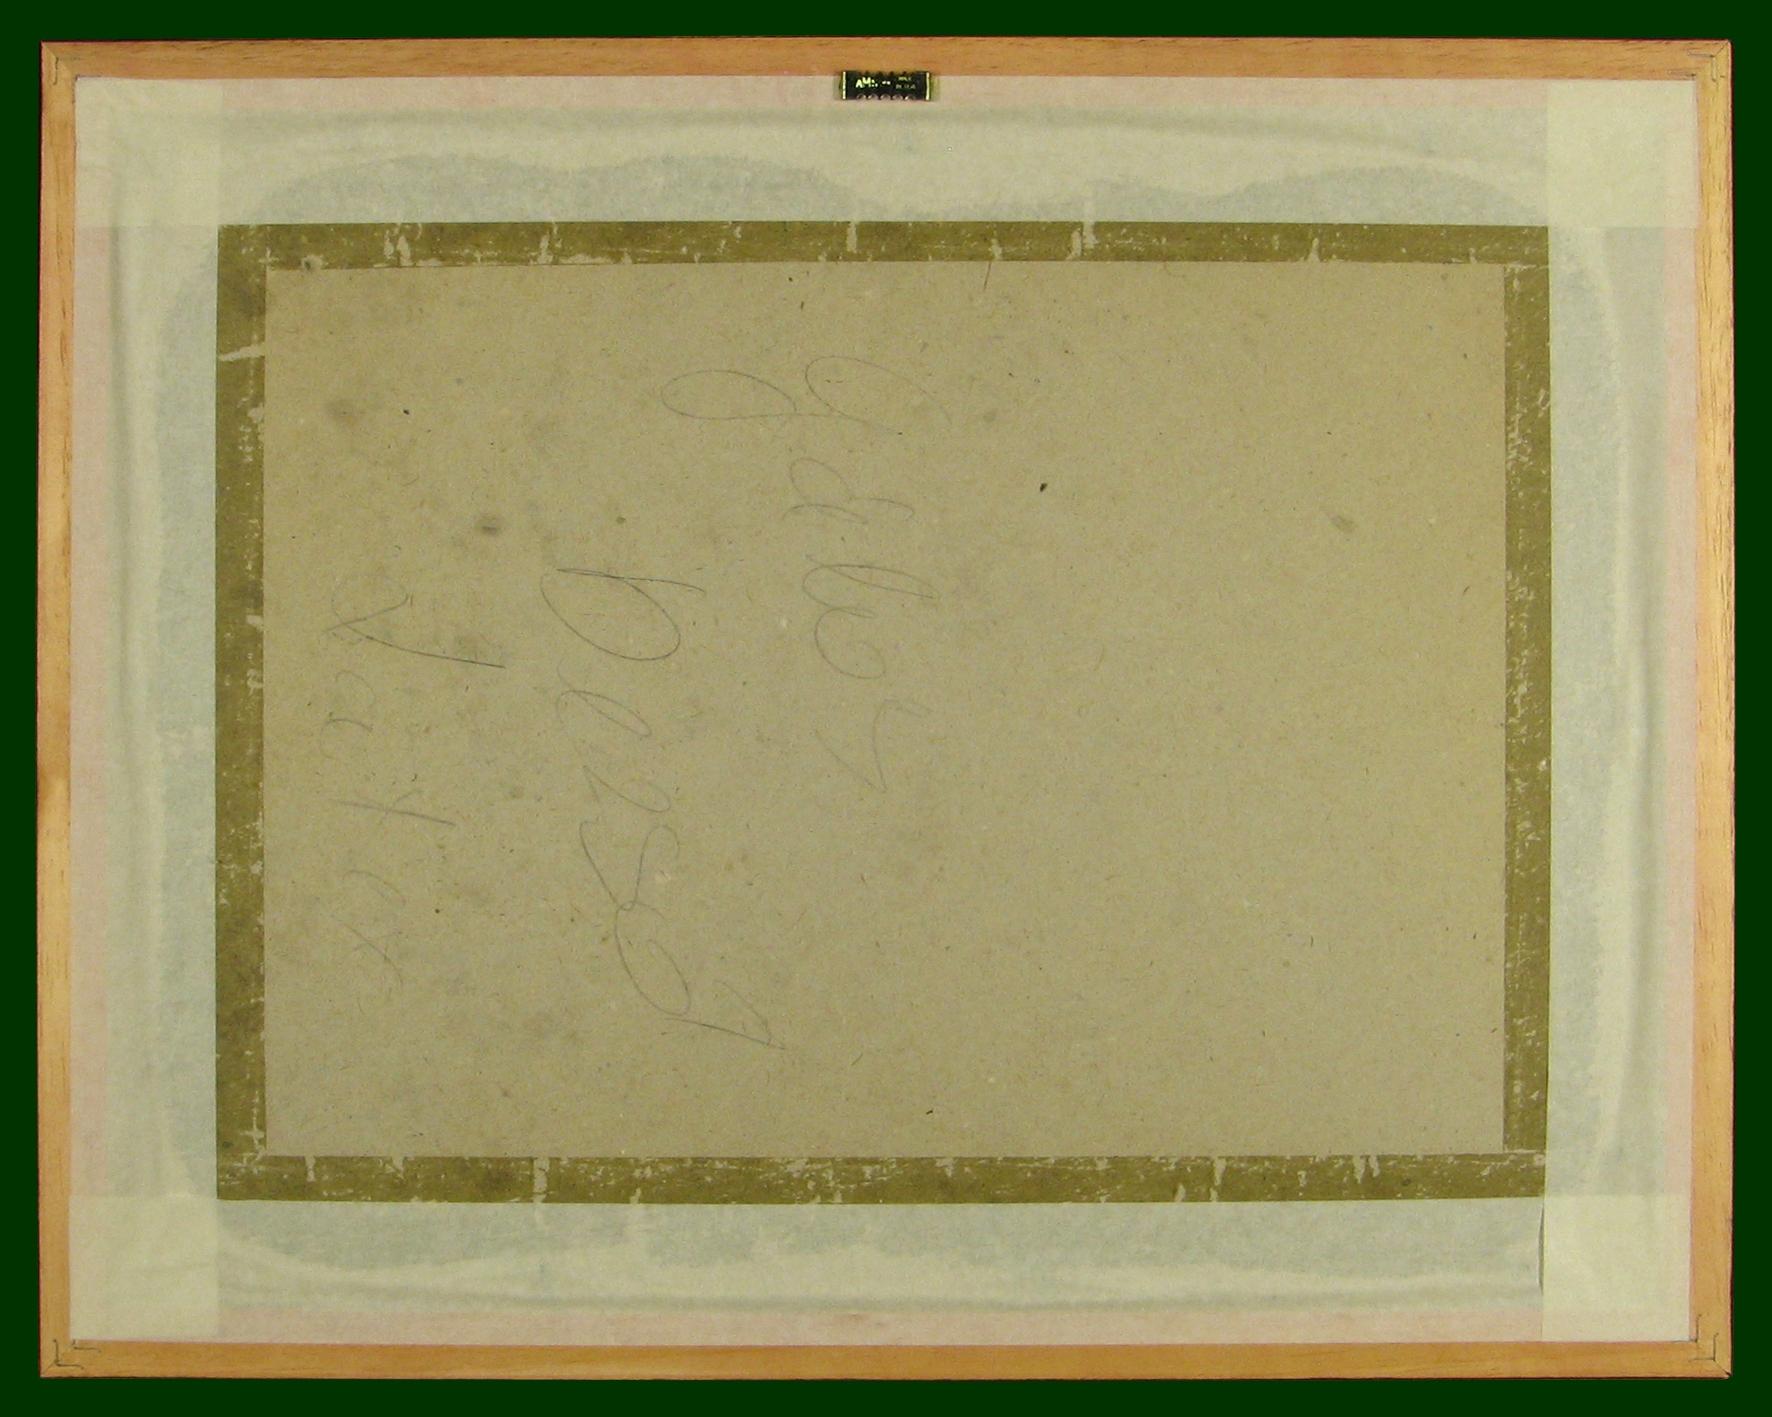 102-16h_t.jpg (1772�1417)